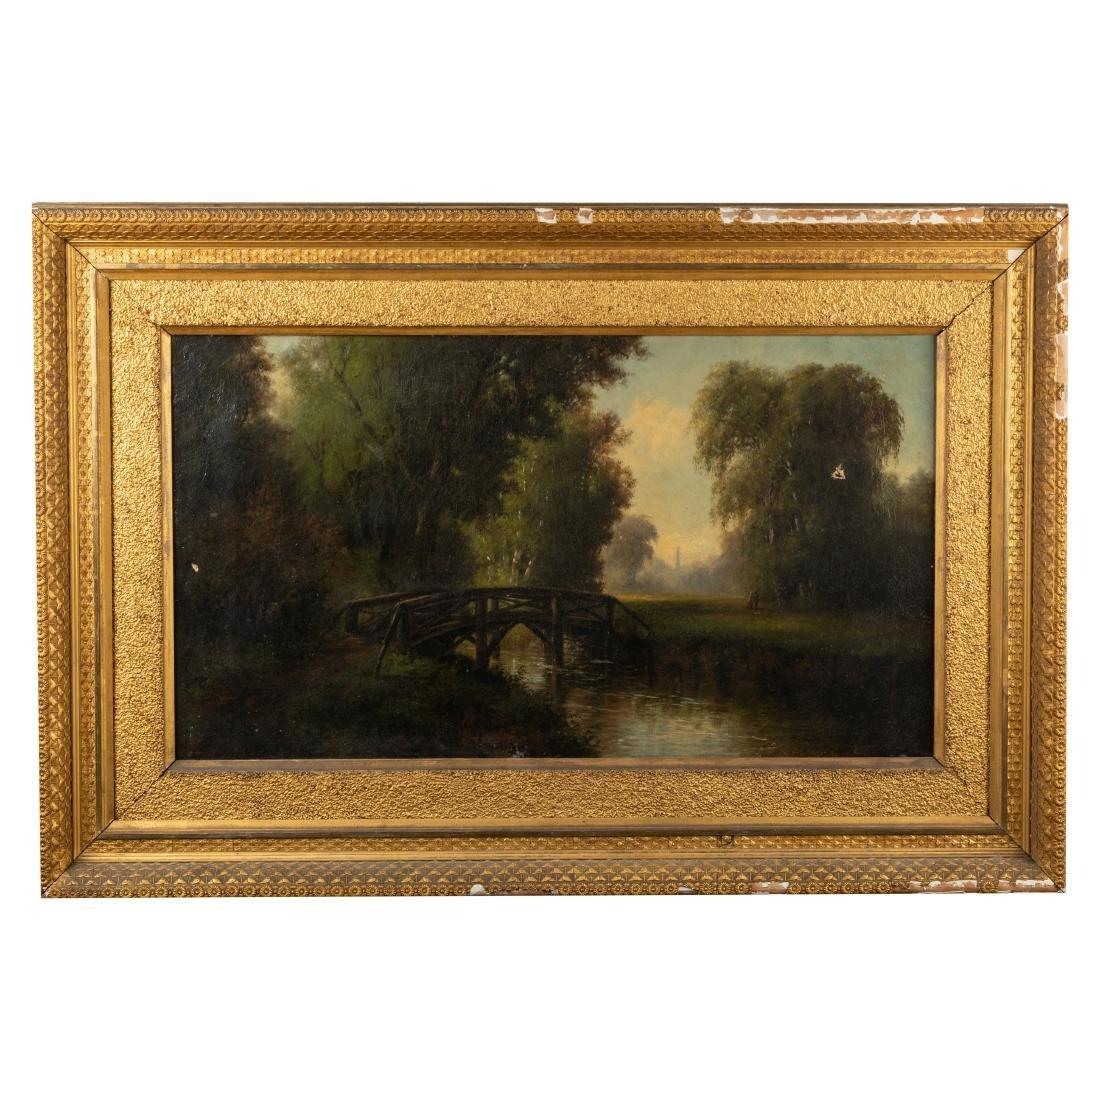 Victorian Oil on Canvas - Bridge in Landscape